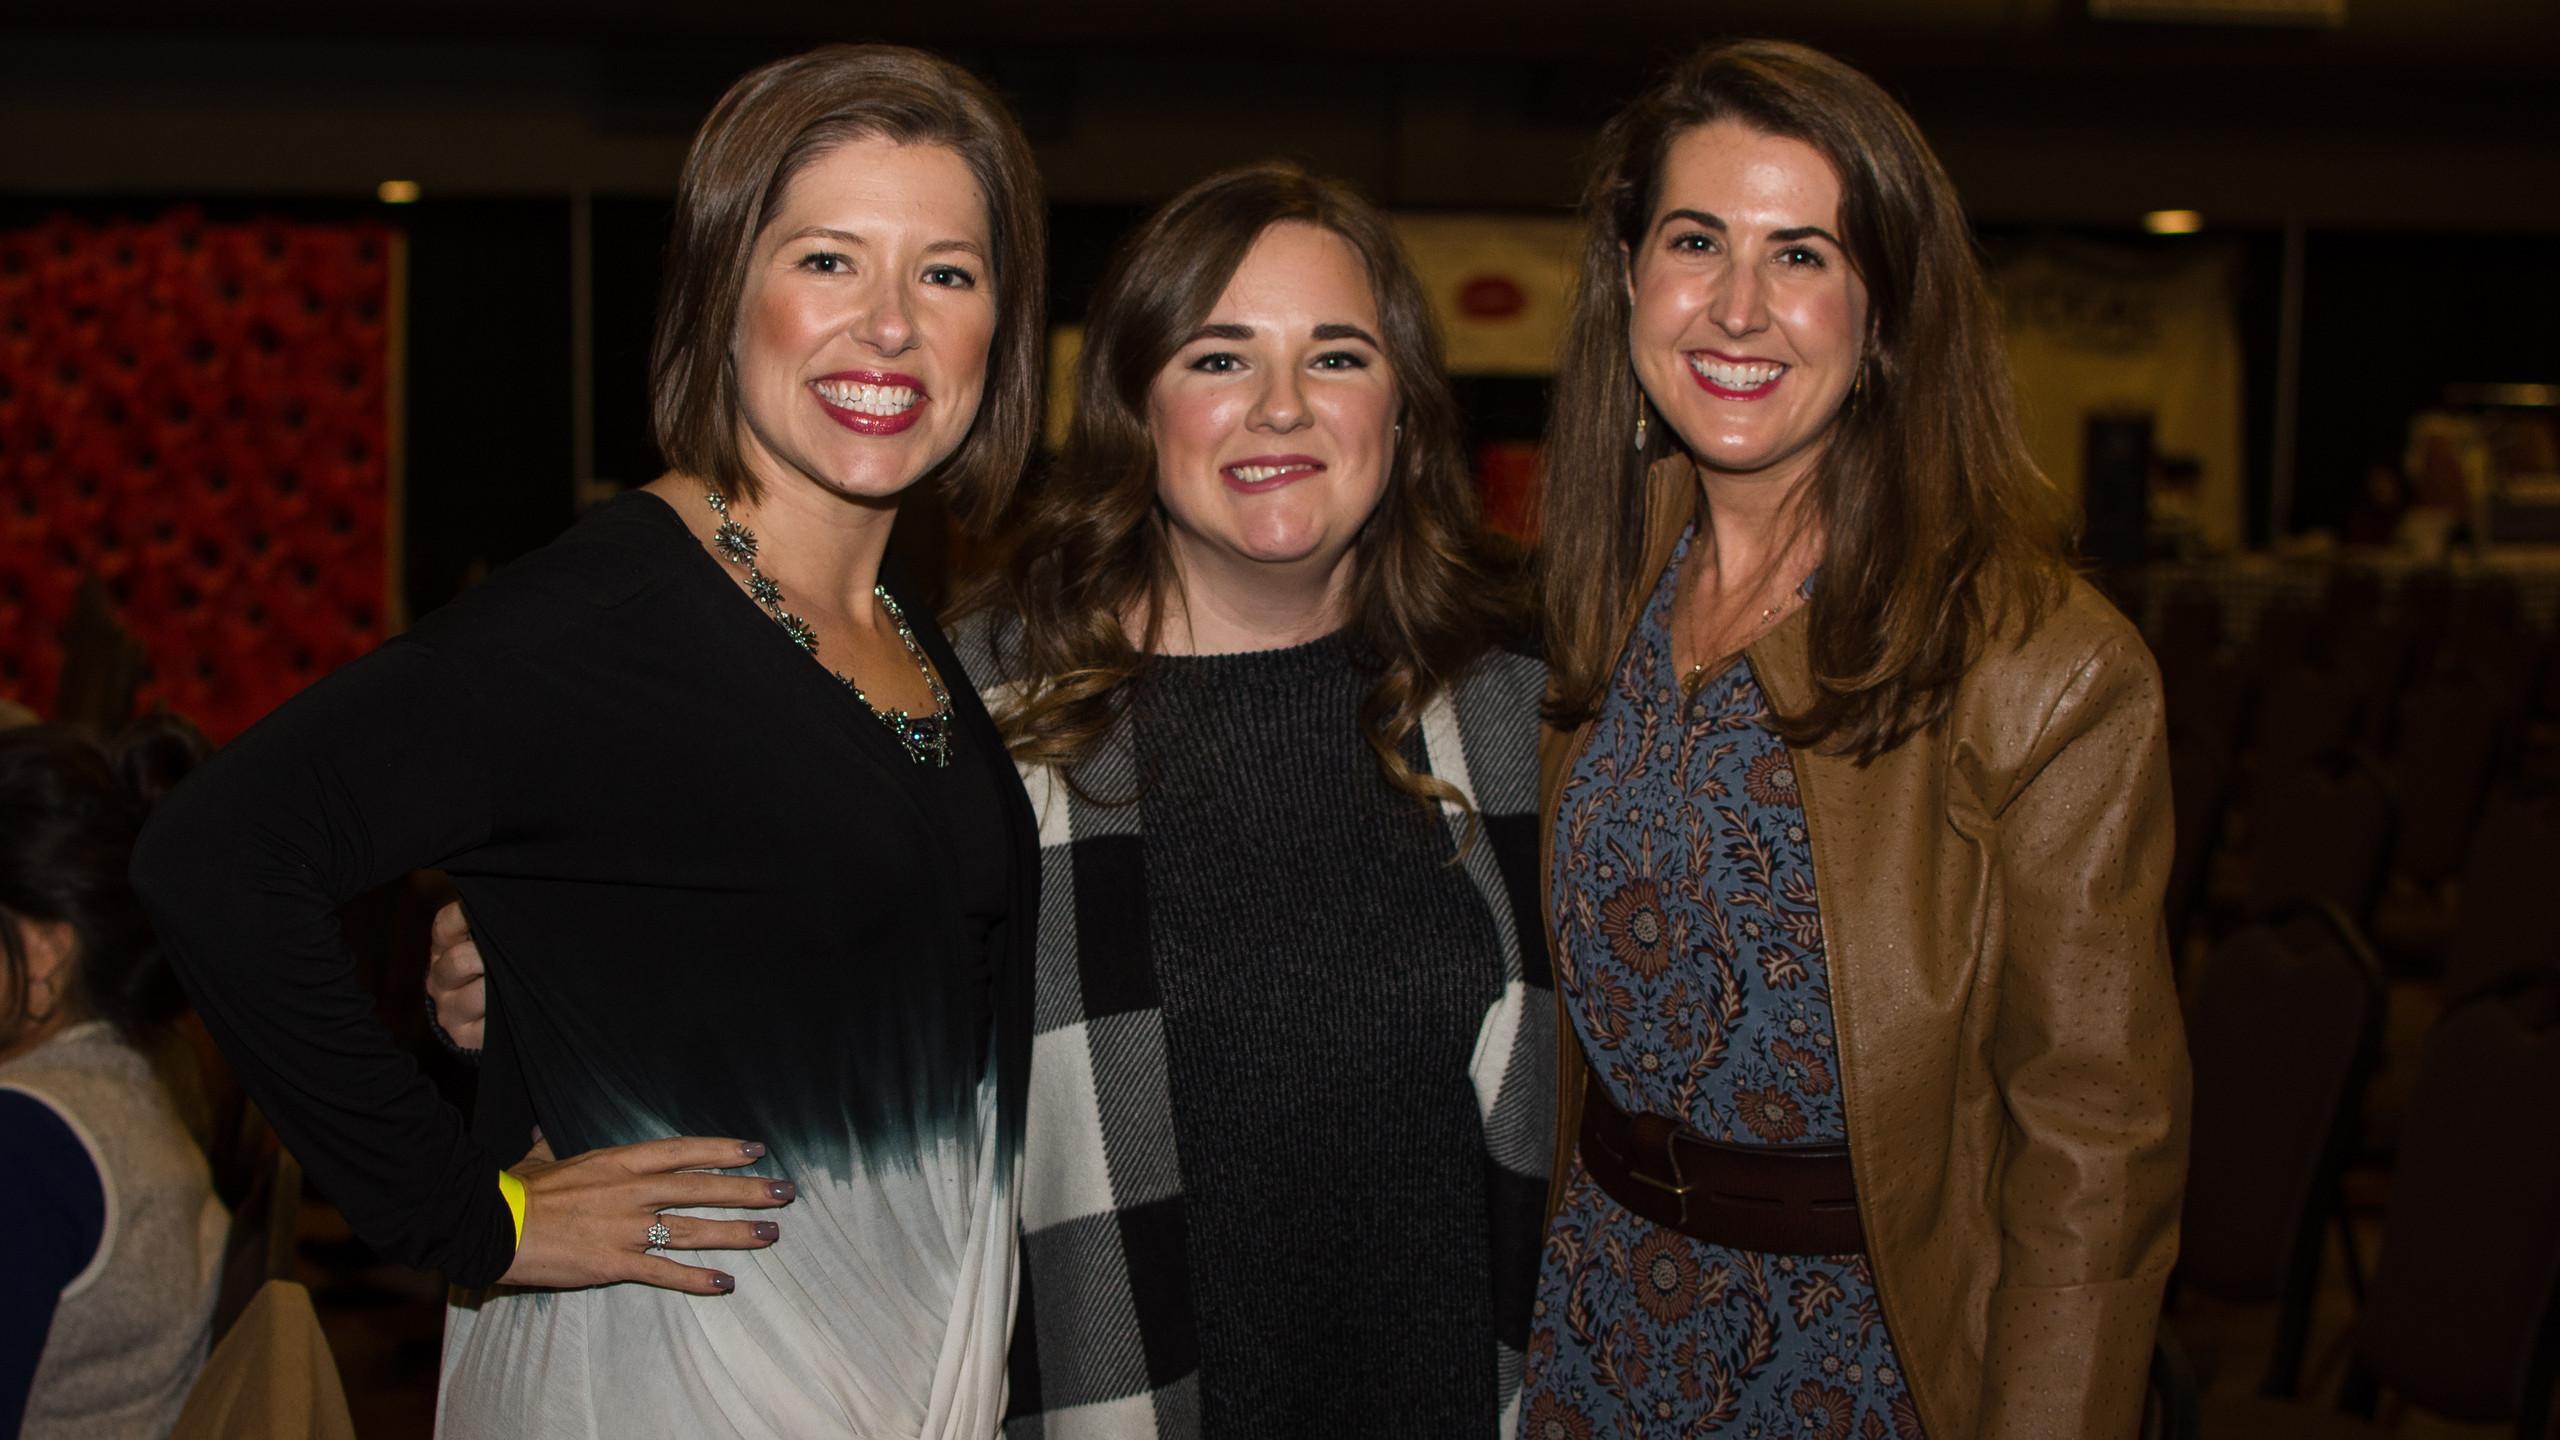 Ashley Jackson, Rebecca Langford, and Jo